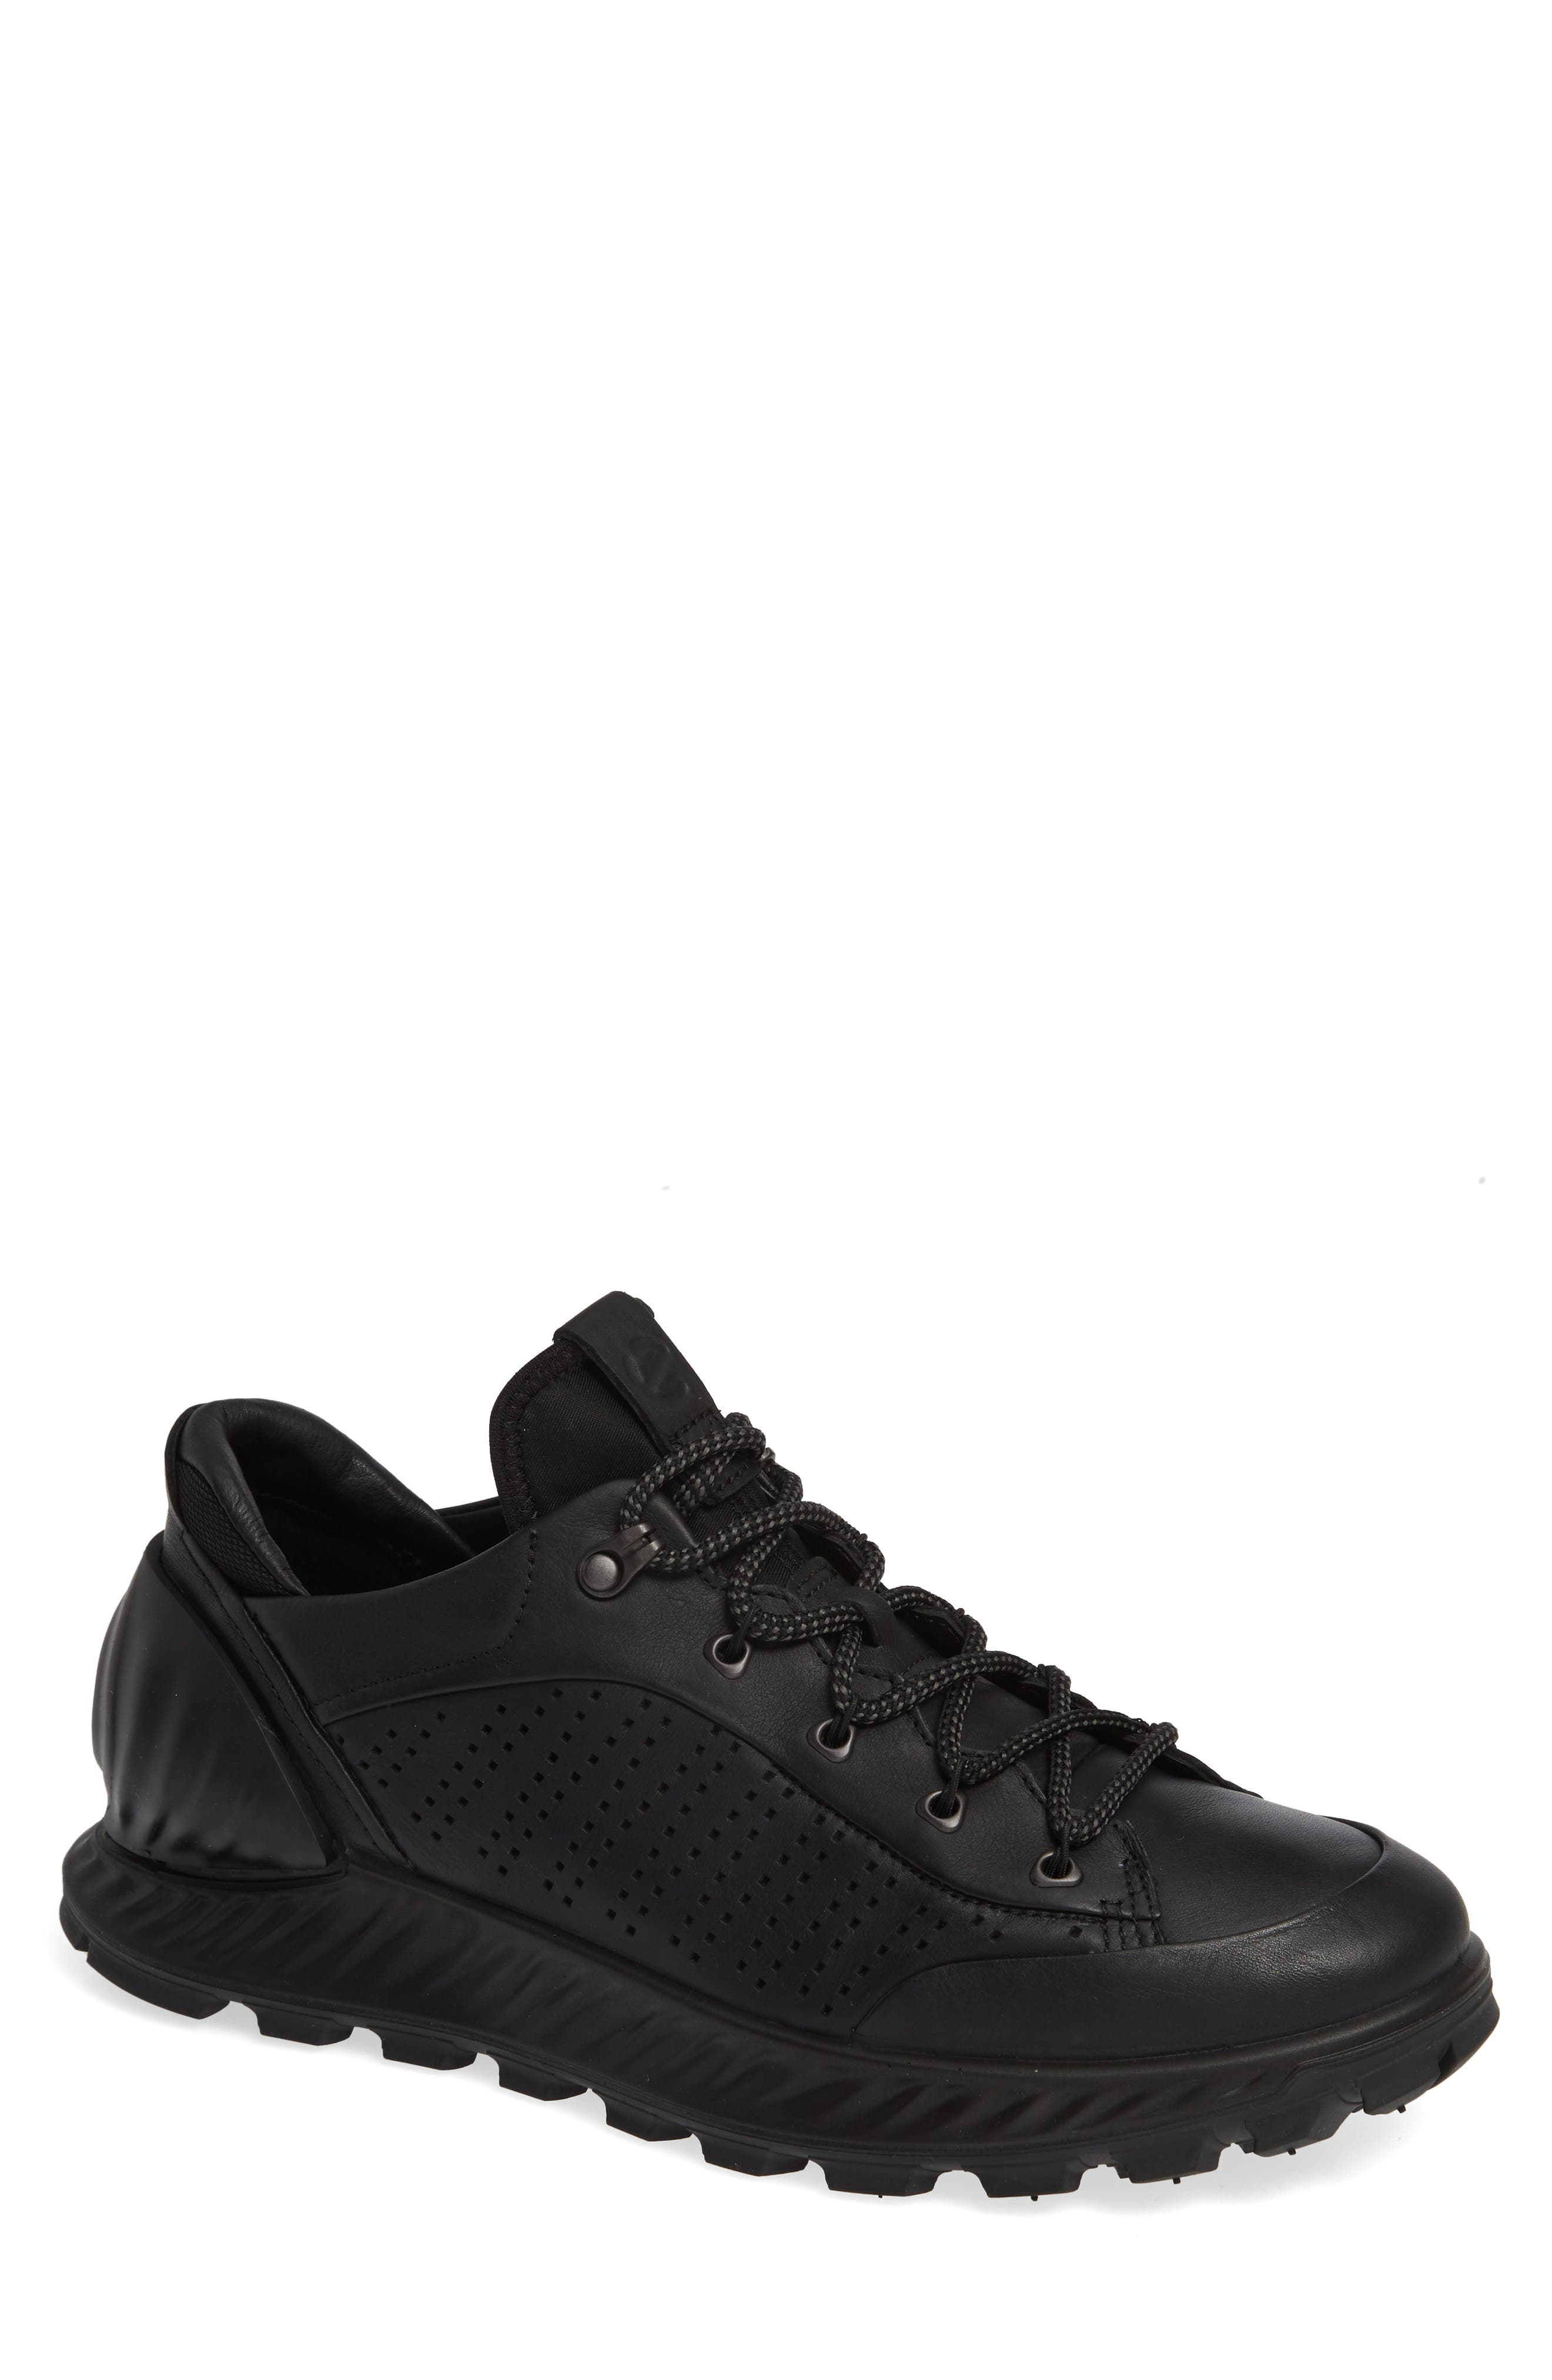 Exostrike High Top Sneaker,                             Main thumbnail 1, color,                             BLACK LEATHER